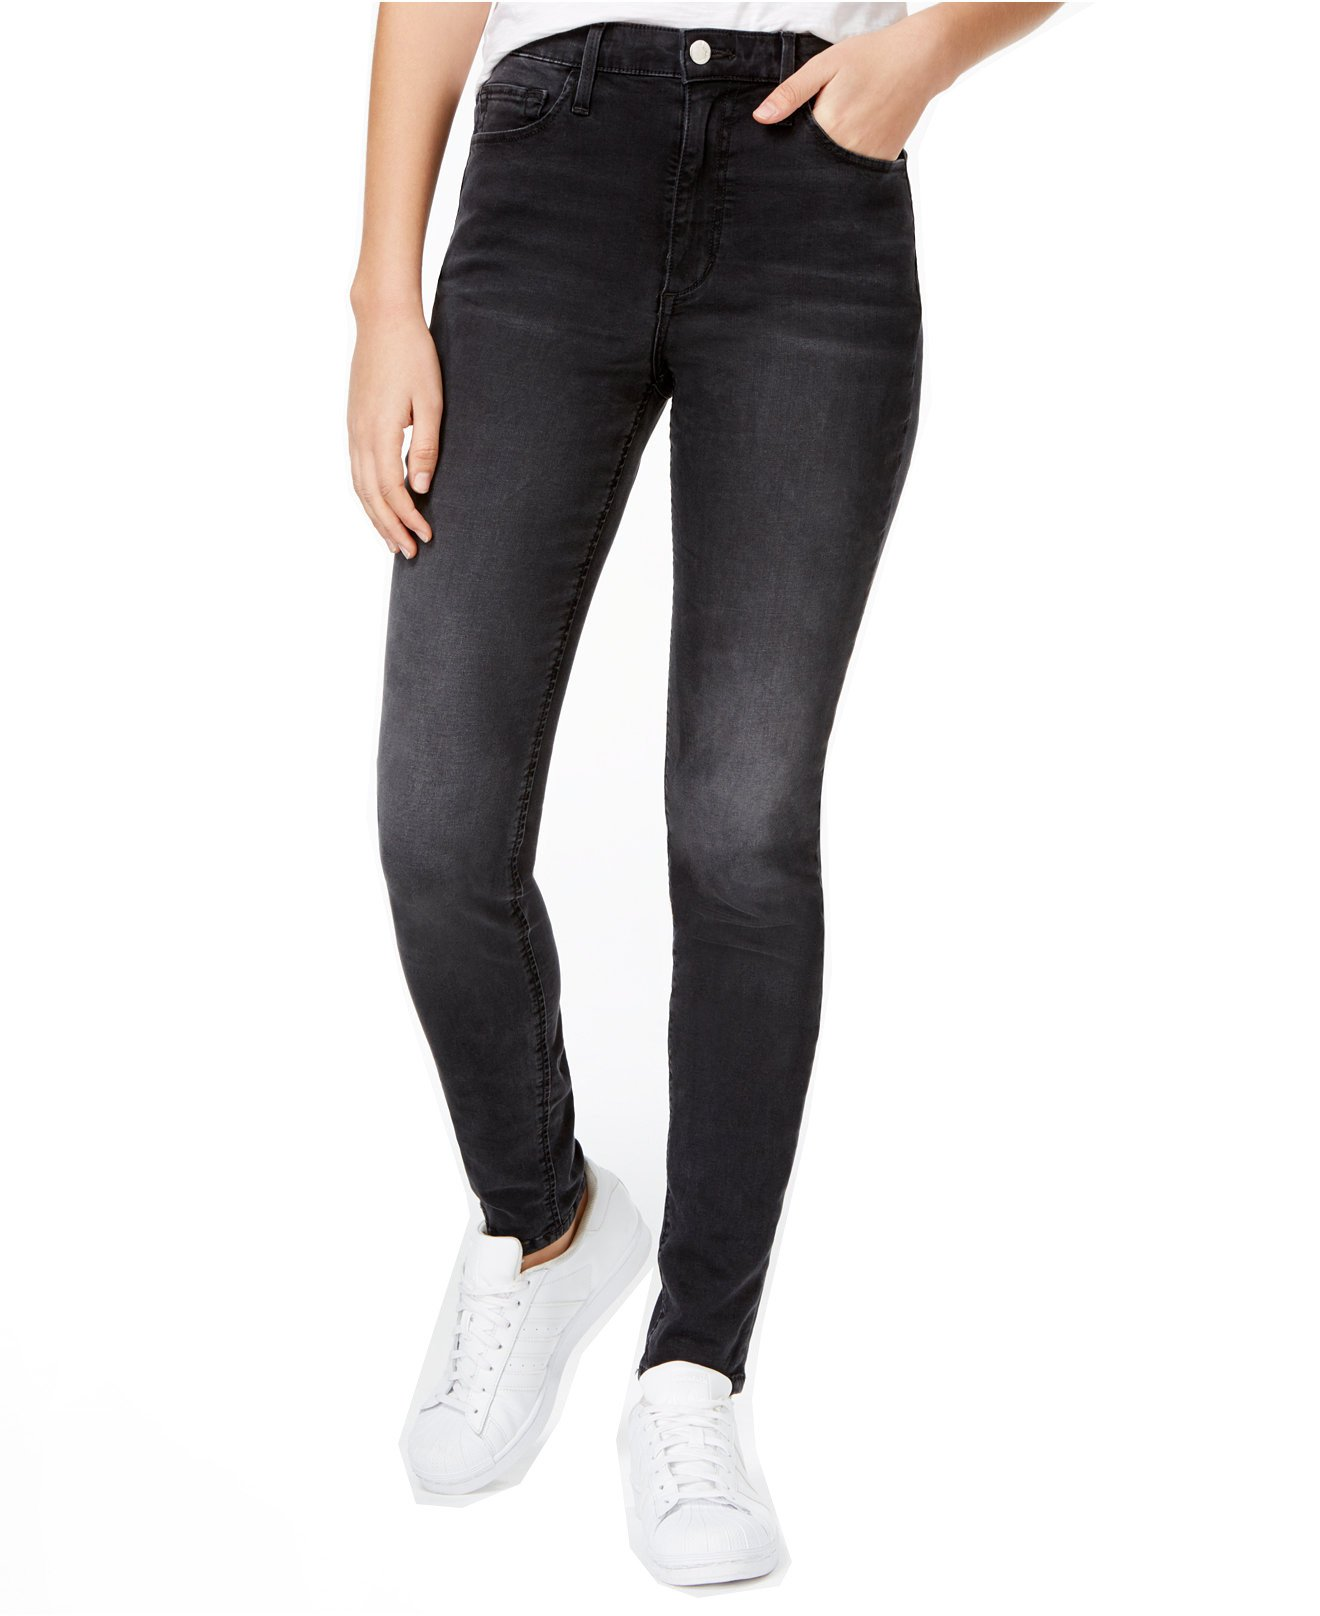 Joe's Jeans Women's Charlie High Rise Skinny Jeans (27, Esma)